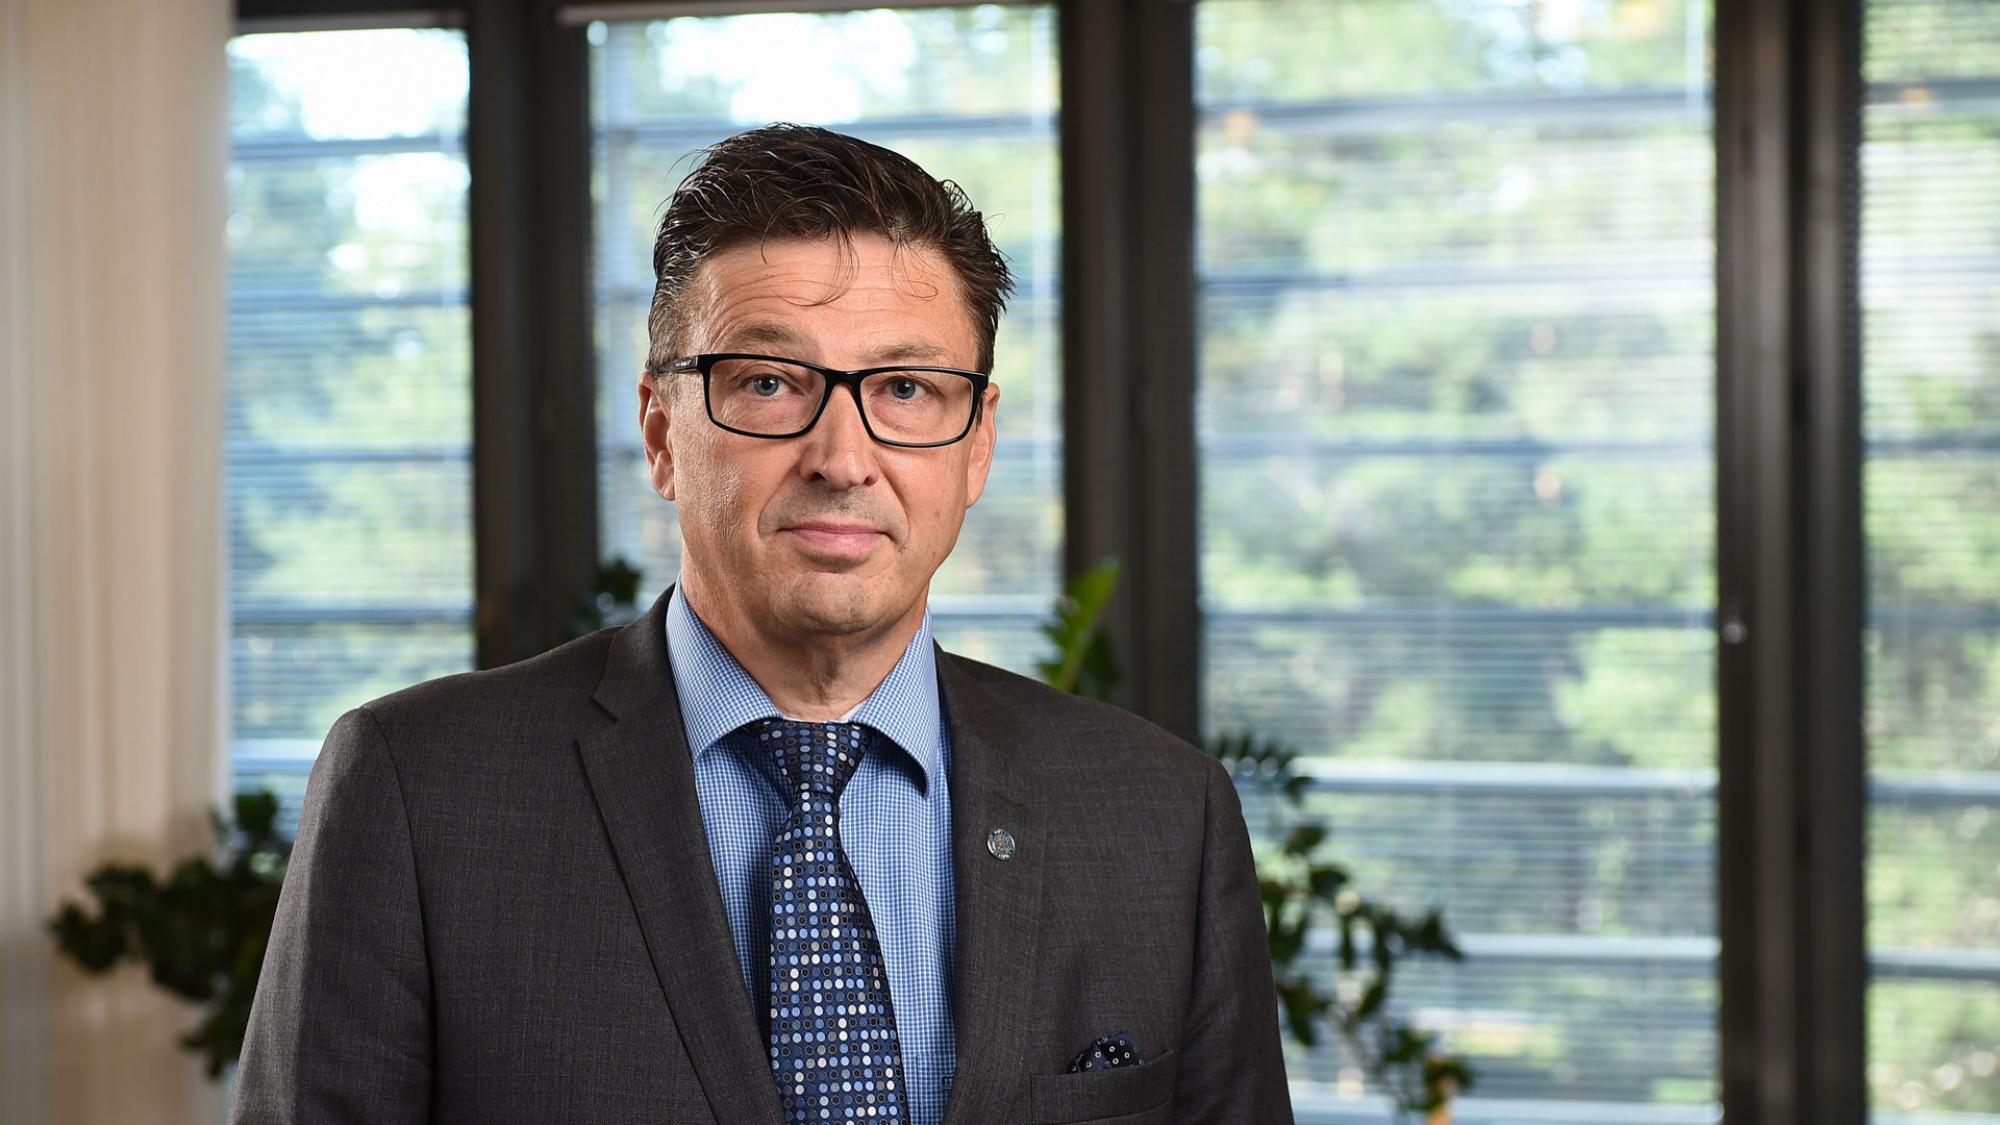 Jouko Niinimäki, rector, University of Oulu